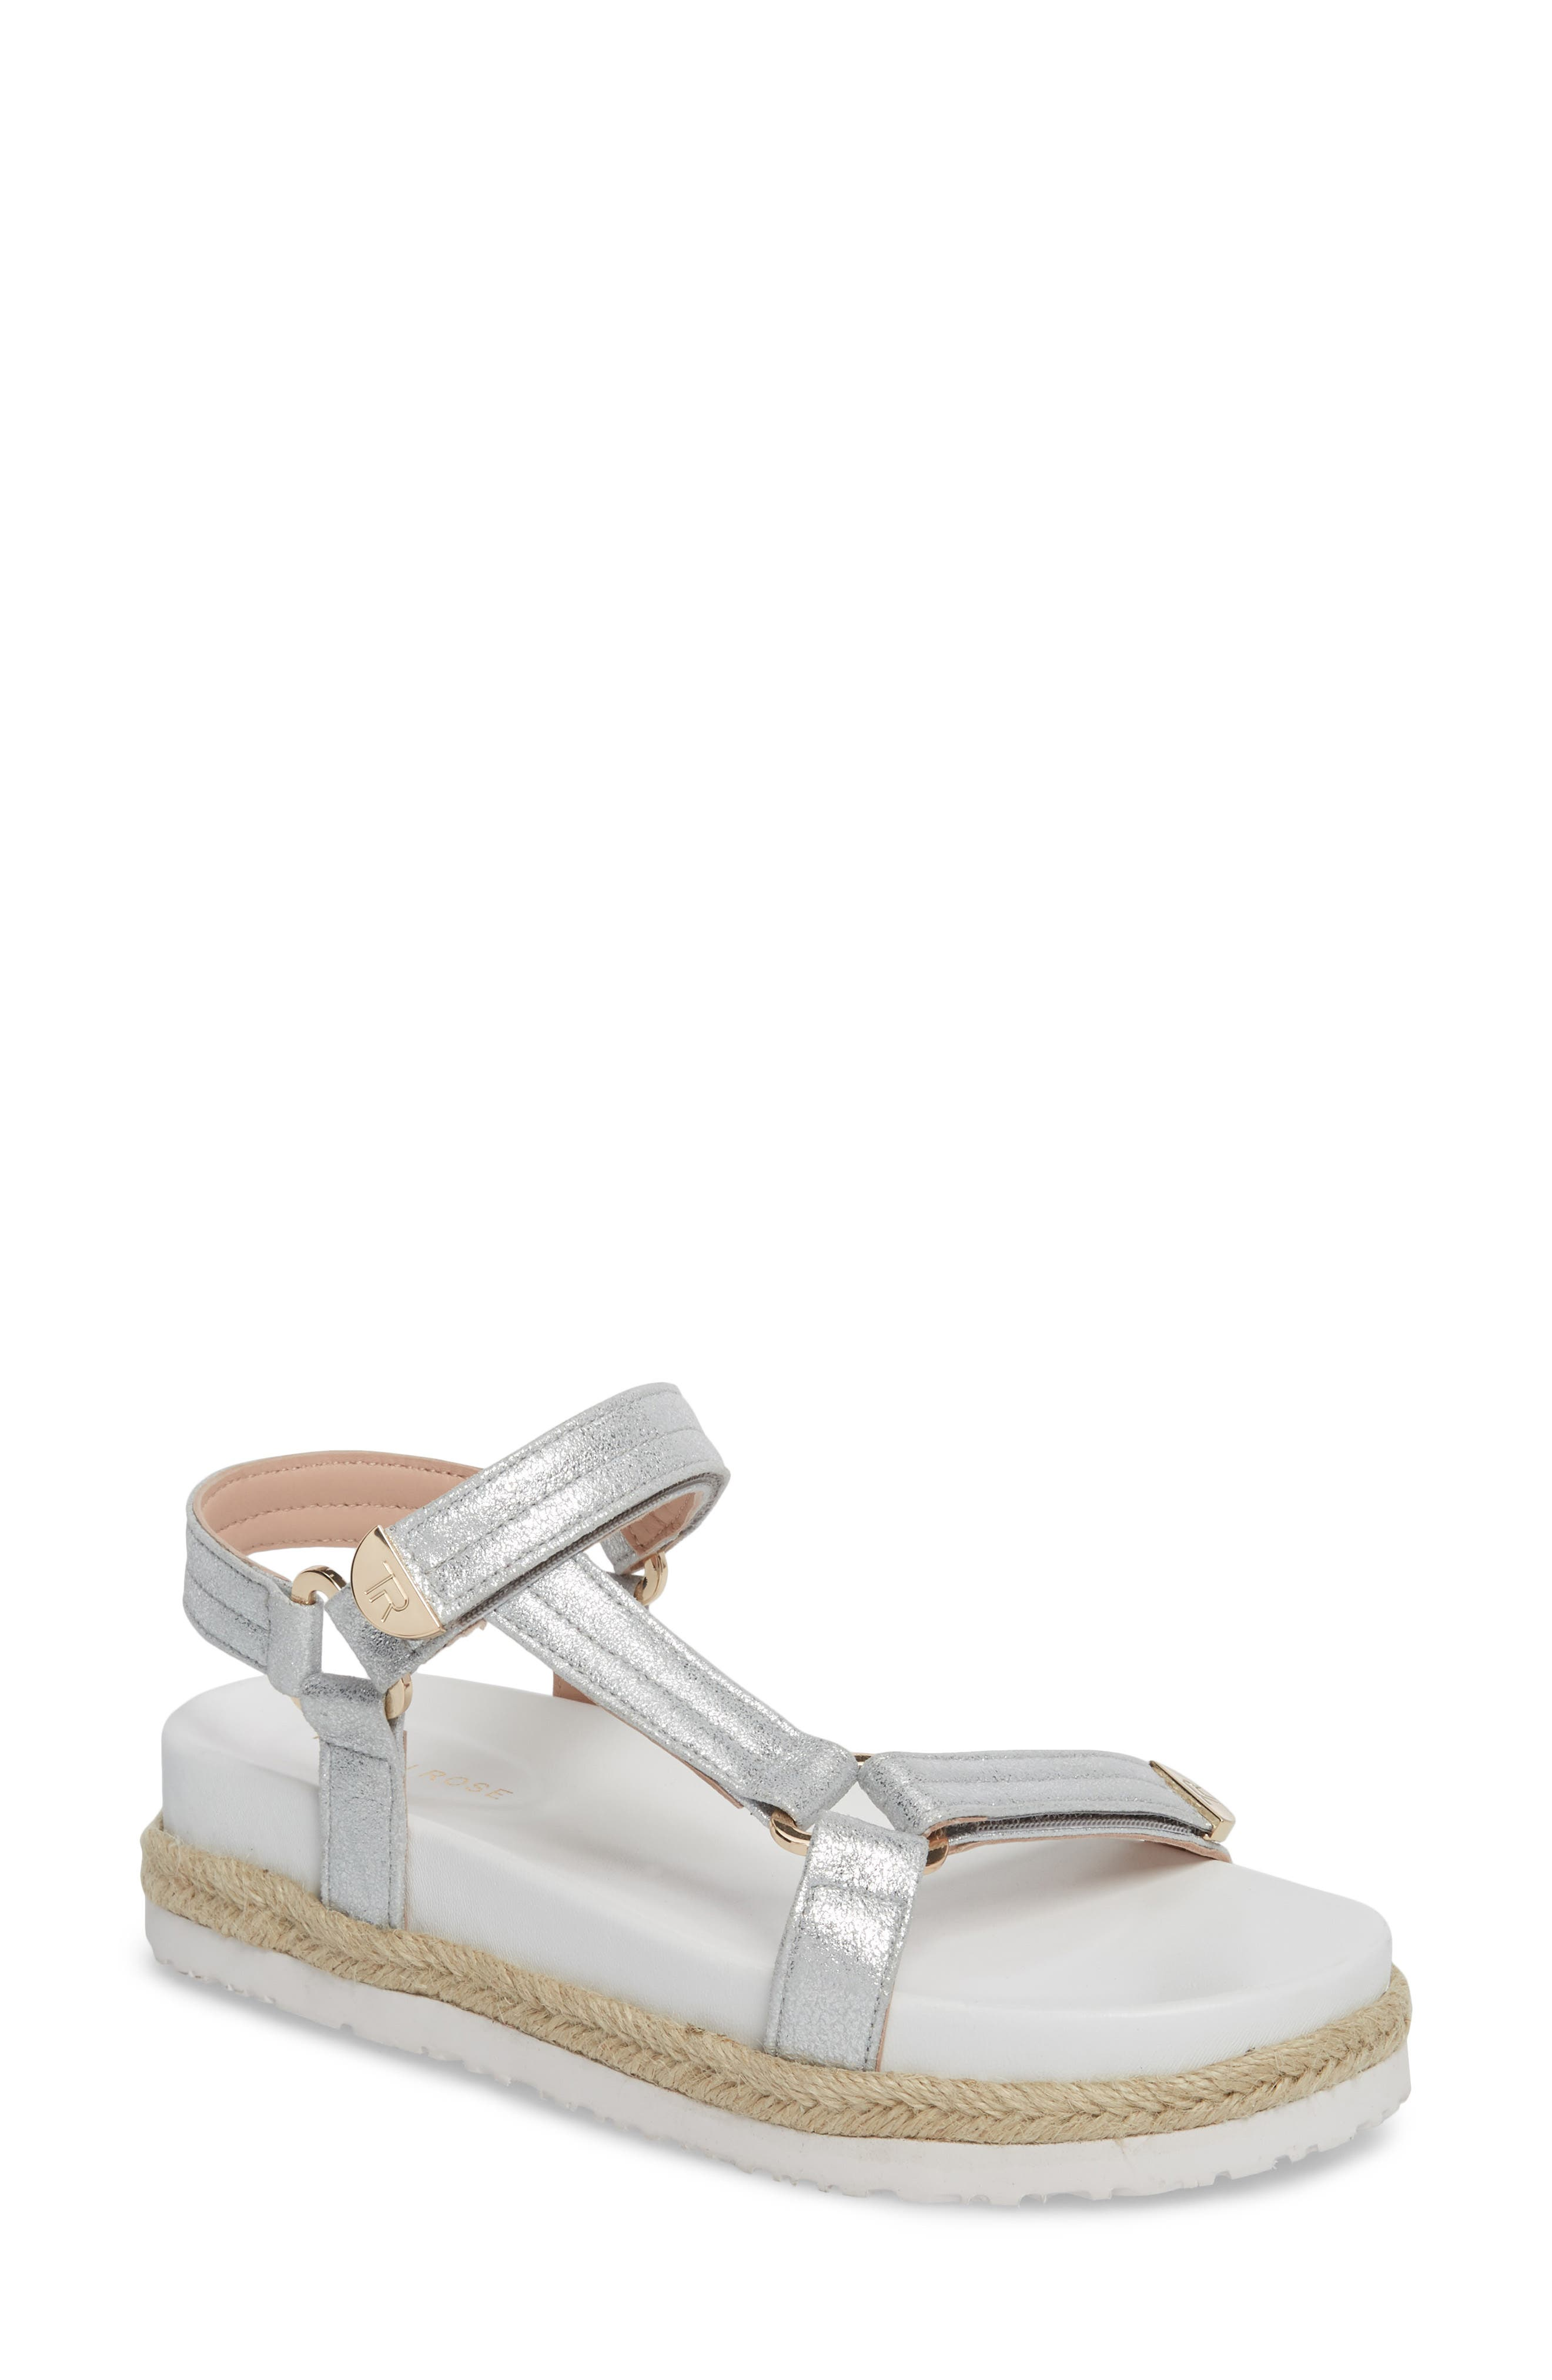 Lydia Platform Sport Sandal,                             Main thumbnail 1, color,                             040